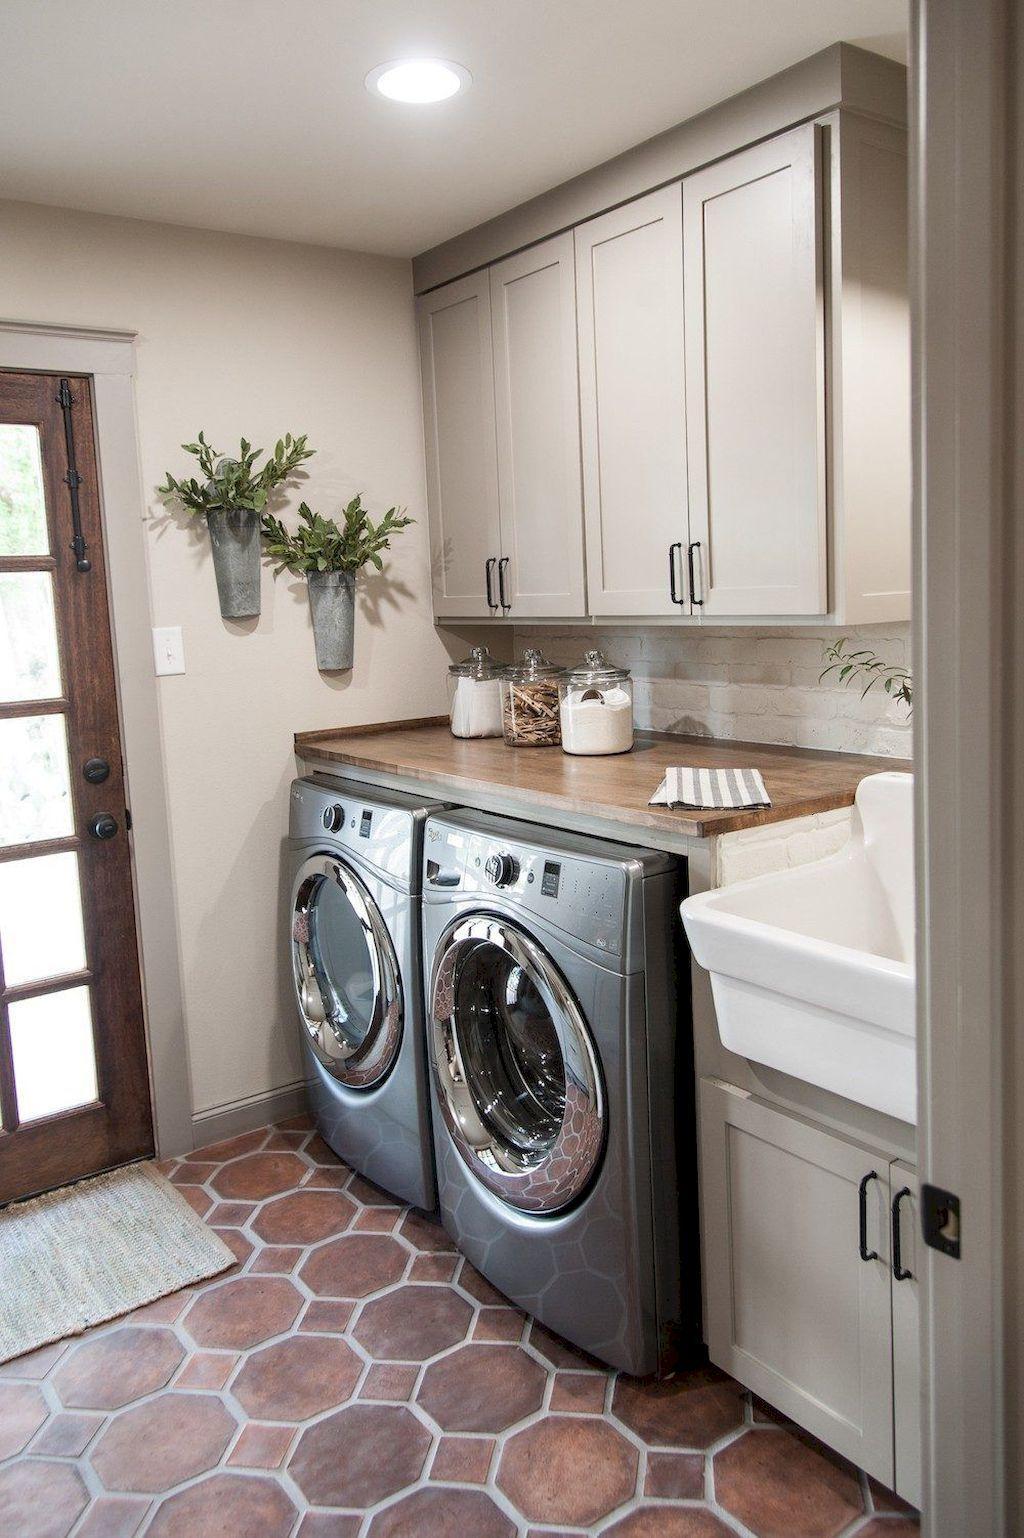 Nice 50 Cool Small Laundry Room Design Ideas Https Rusticroom Co 1317 50 Cool Small Laundry Ro Rustic Laundry Rooms Laundry Room Remodel Laundry Room Storage